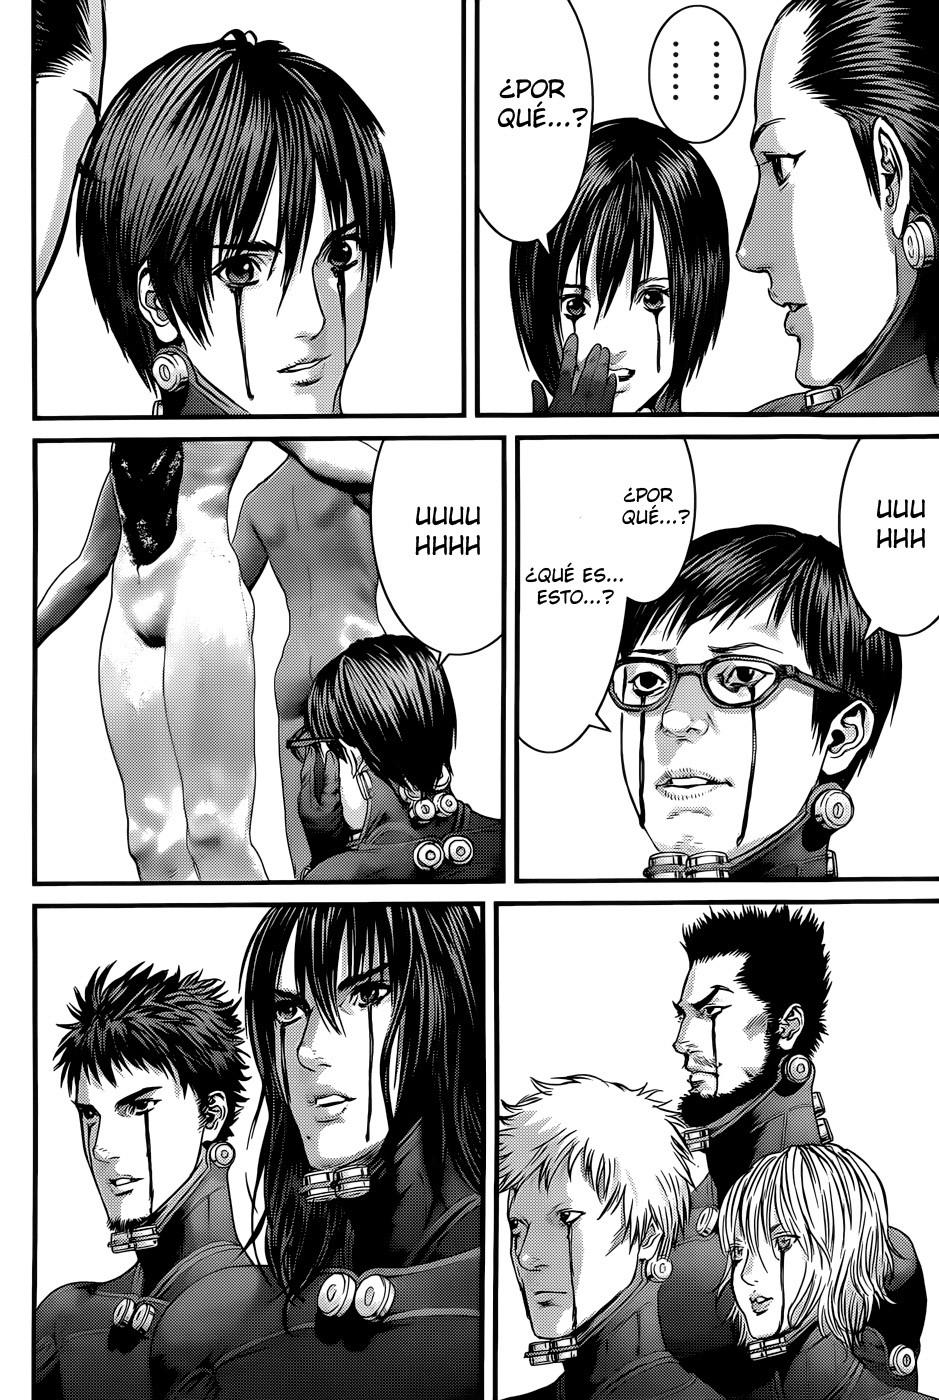 Manga Gantz capitulo 369 07